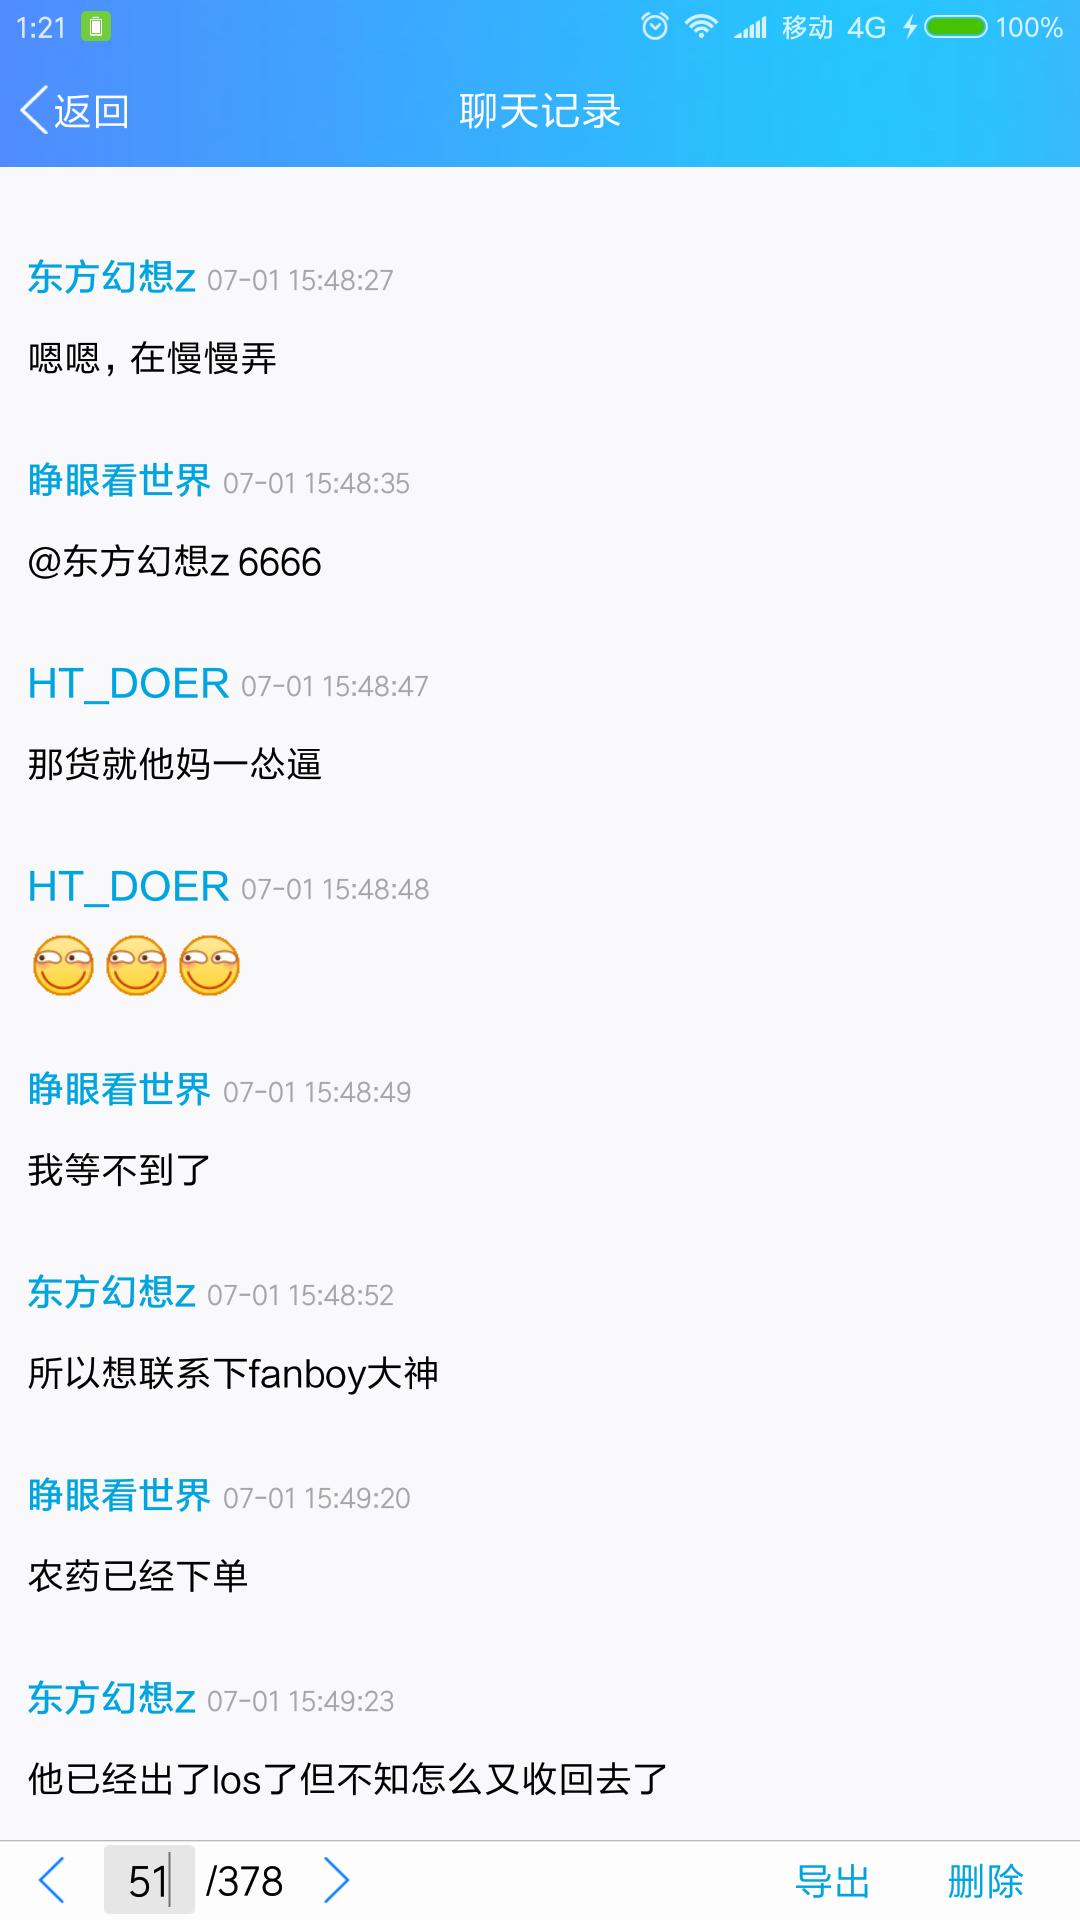 Screenshot_2017-07-09-01-21-18-154_com.tencent.mobileqq.png